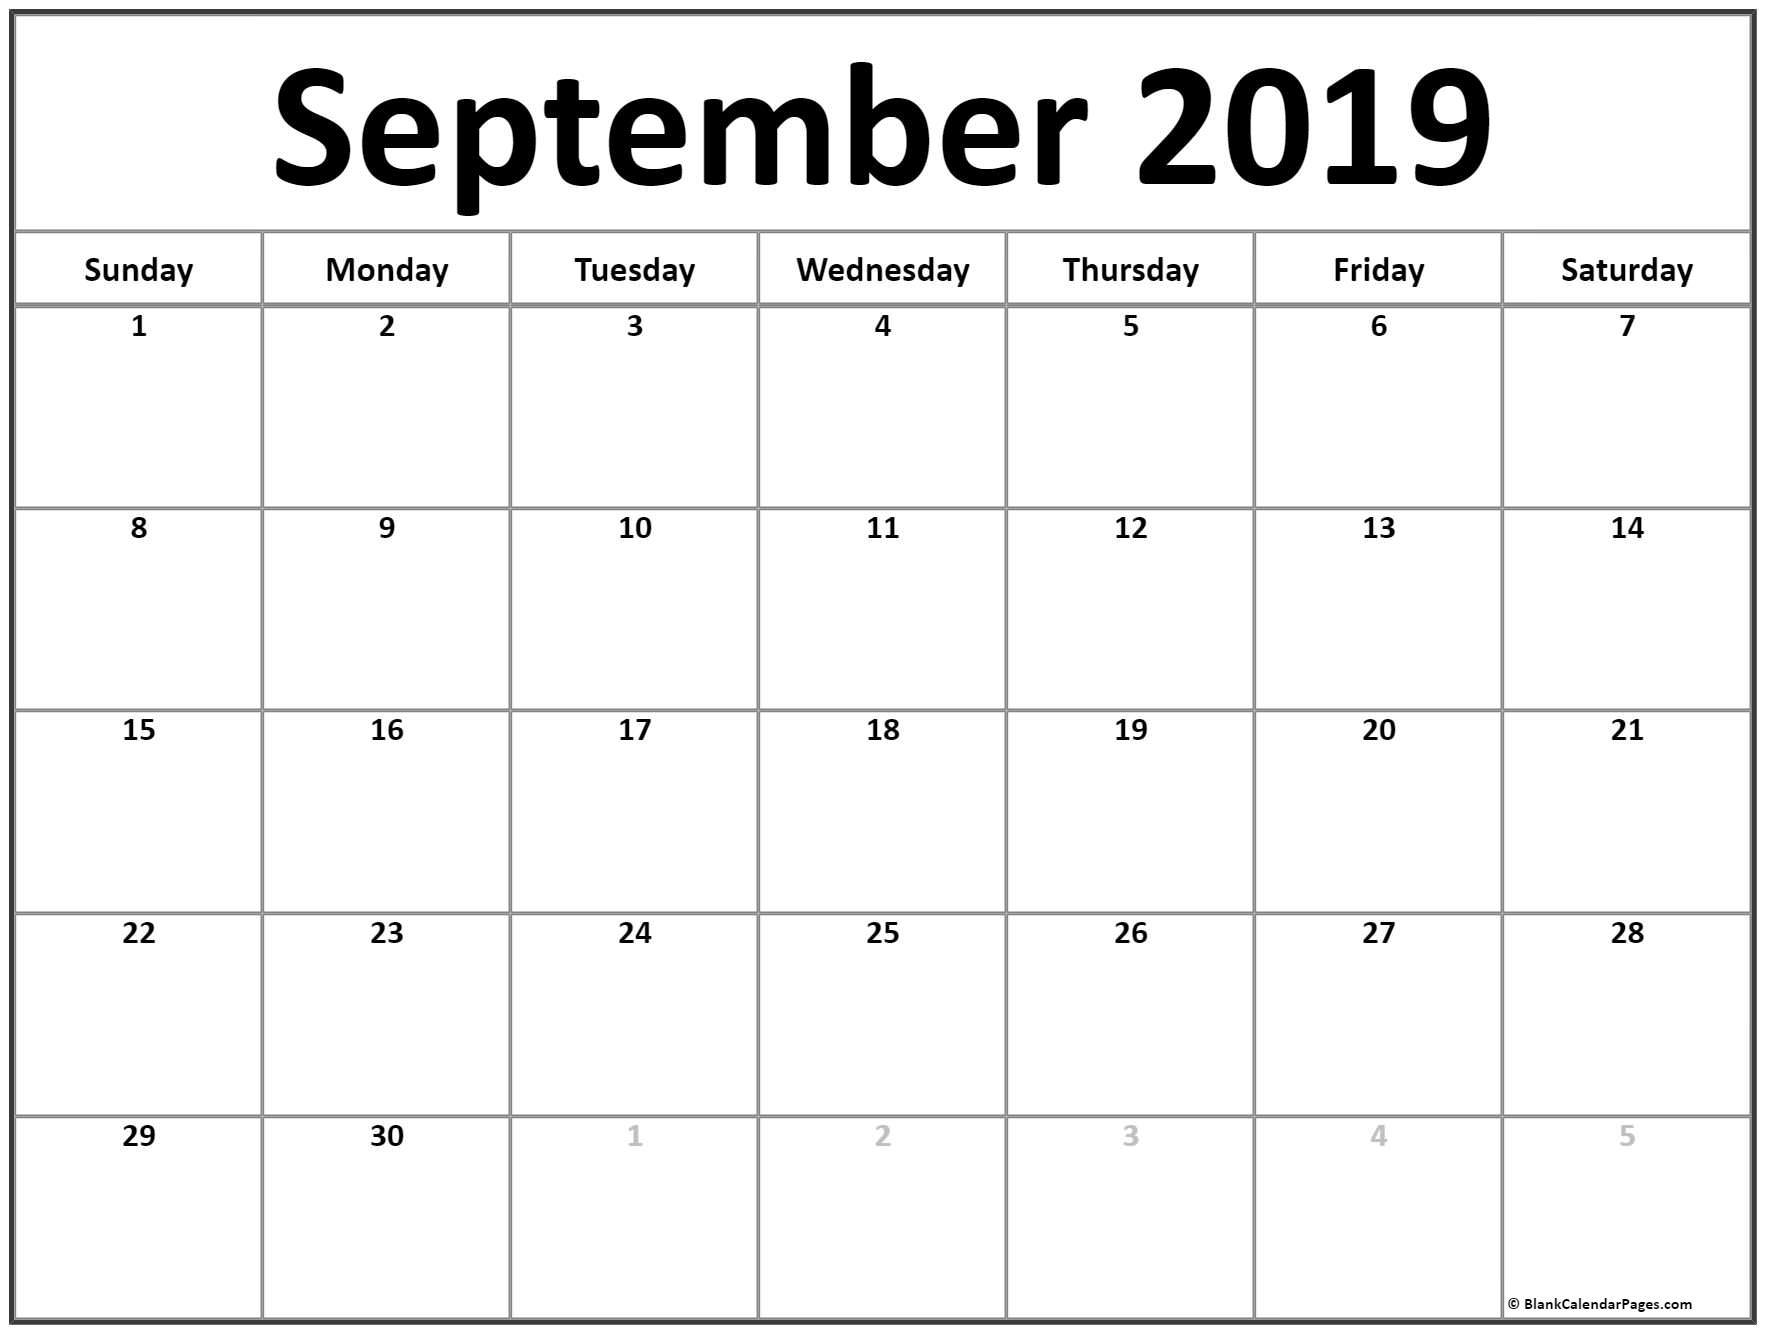 September 2019 Calendar | Free Printable Monthly Calendars